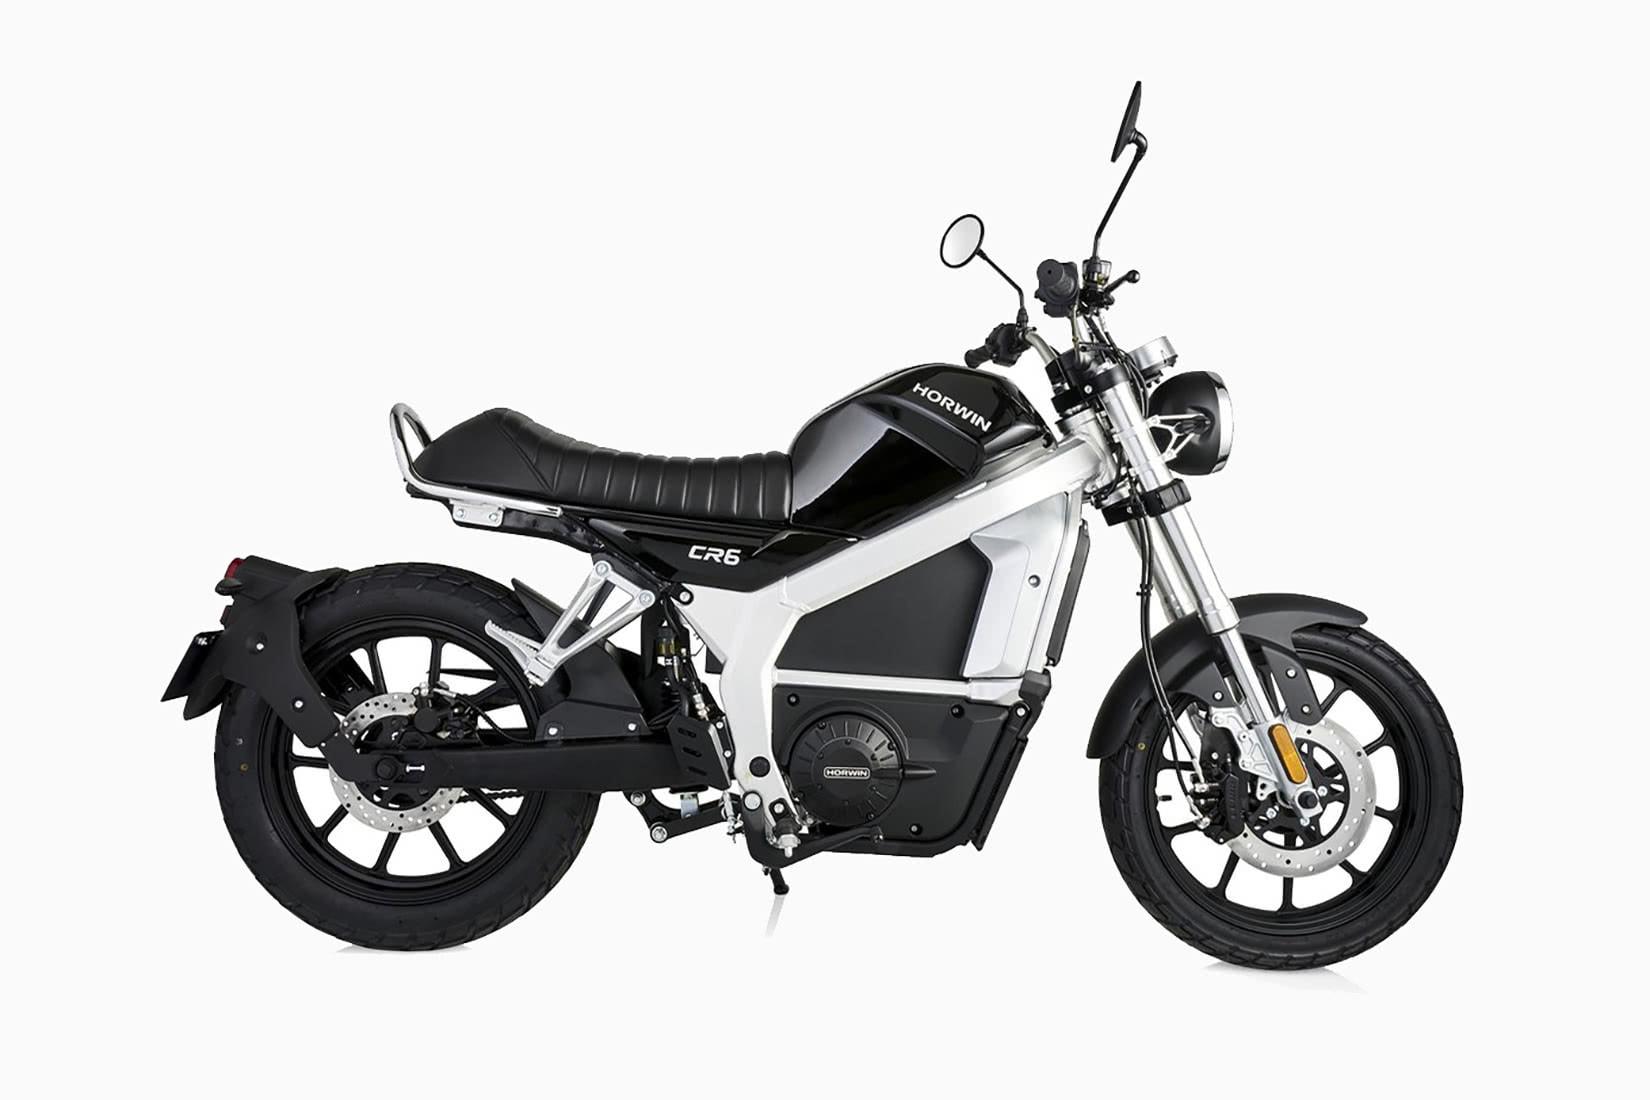 best electric motorcycles 2021 luxury Horwin CR6 - Luxe Digital